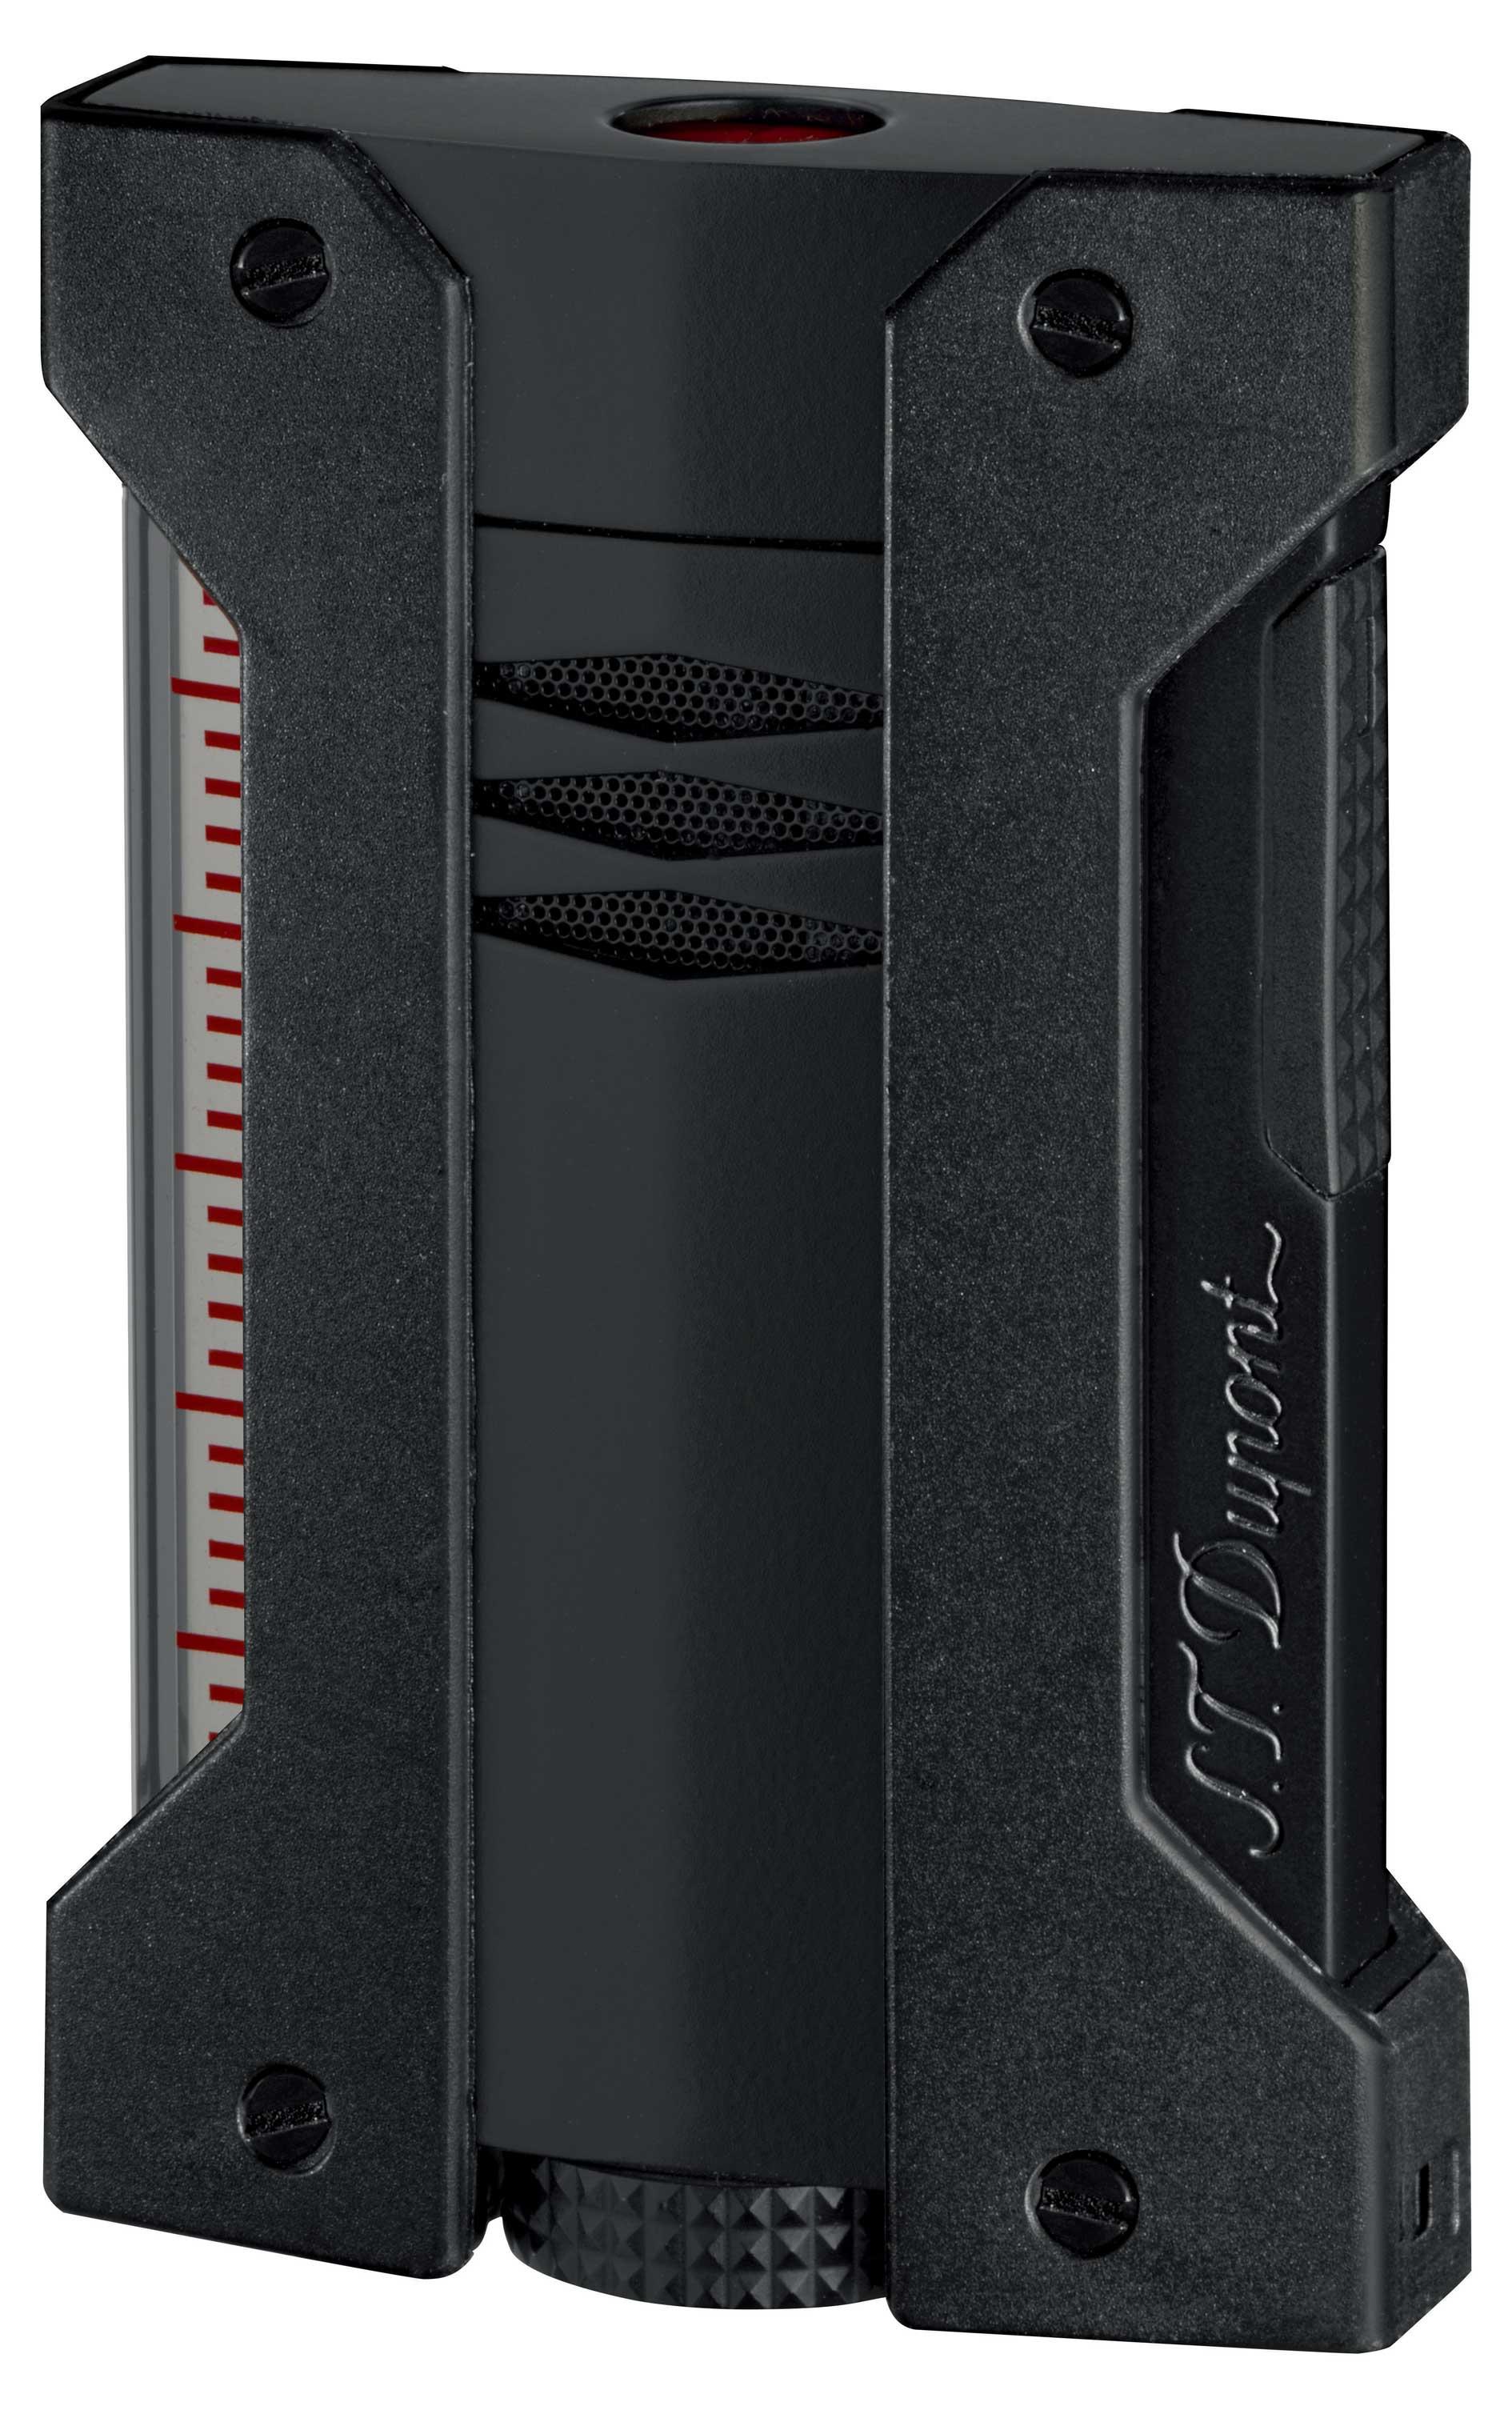 ST Dupont Lighter – Defi Extreme – Black bc2ae8a1bdb